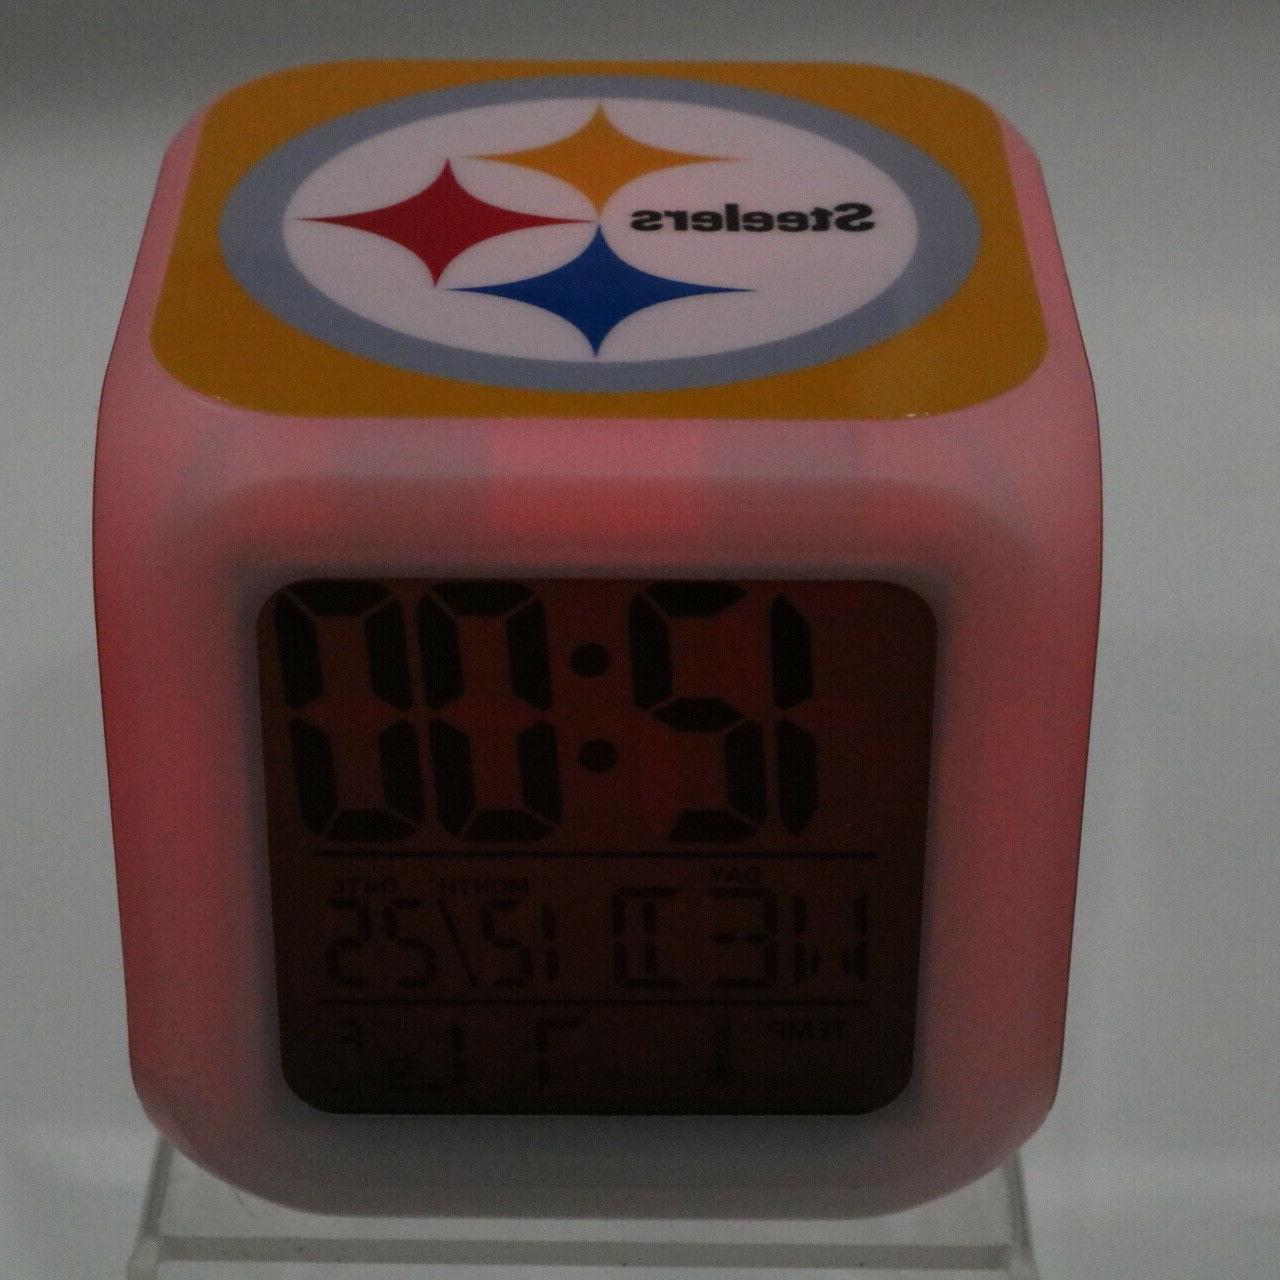 Pittsburgh Steelers Alarm Decor Roethlisberger Gift